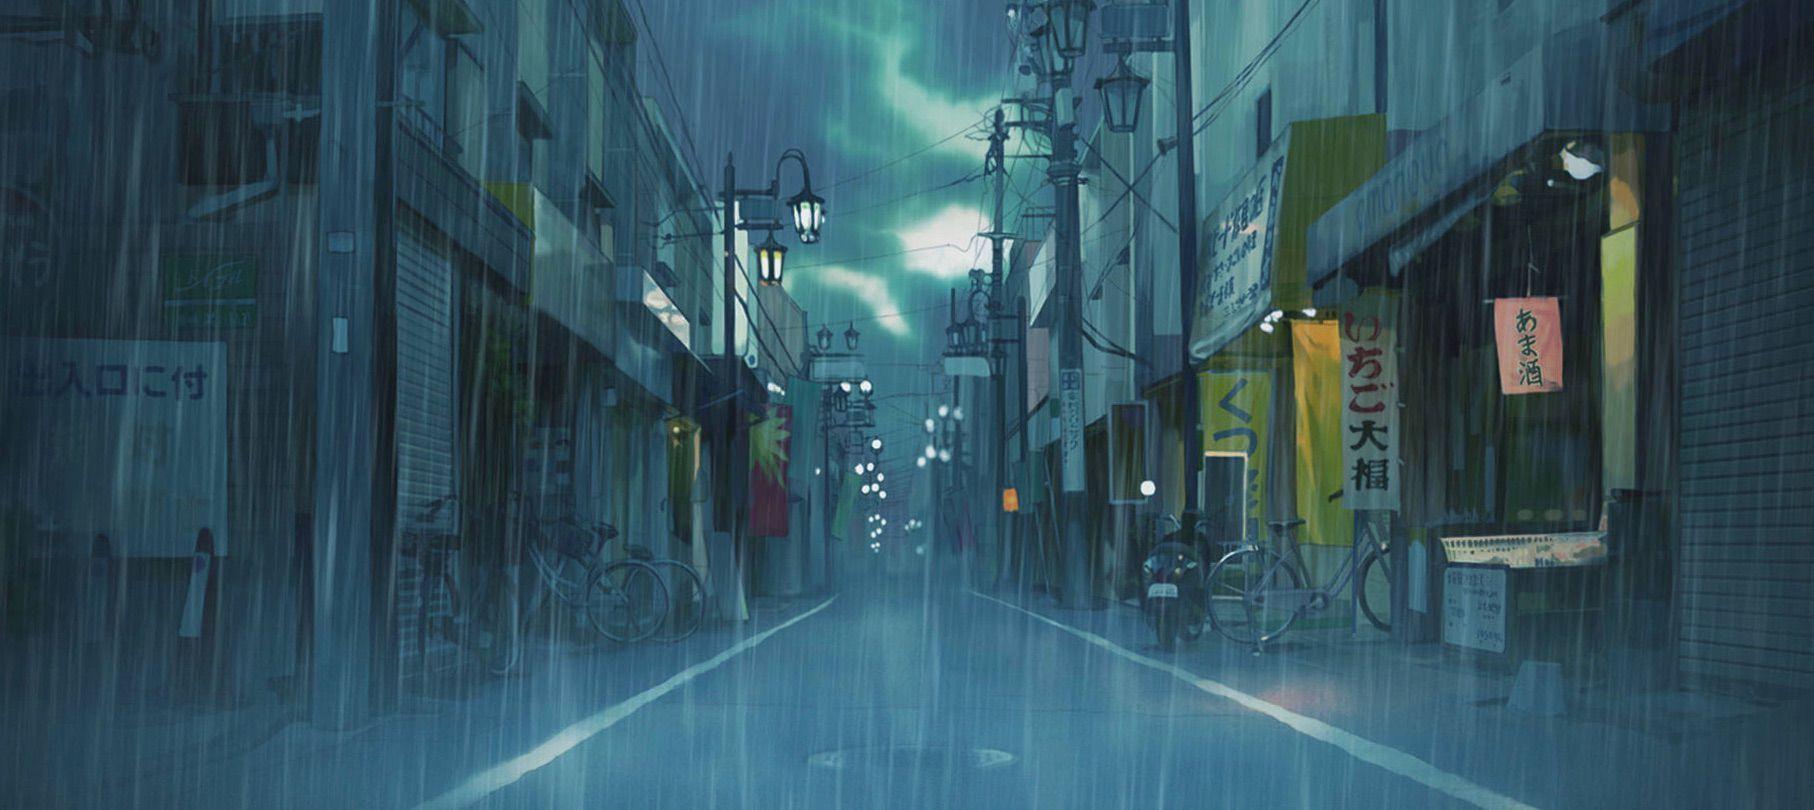 Pin On Anime Fondos 14 wallpaper anime city